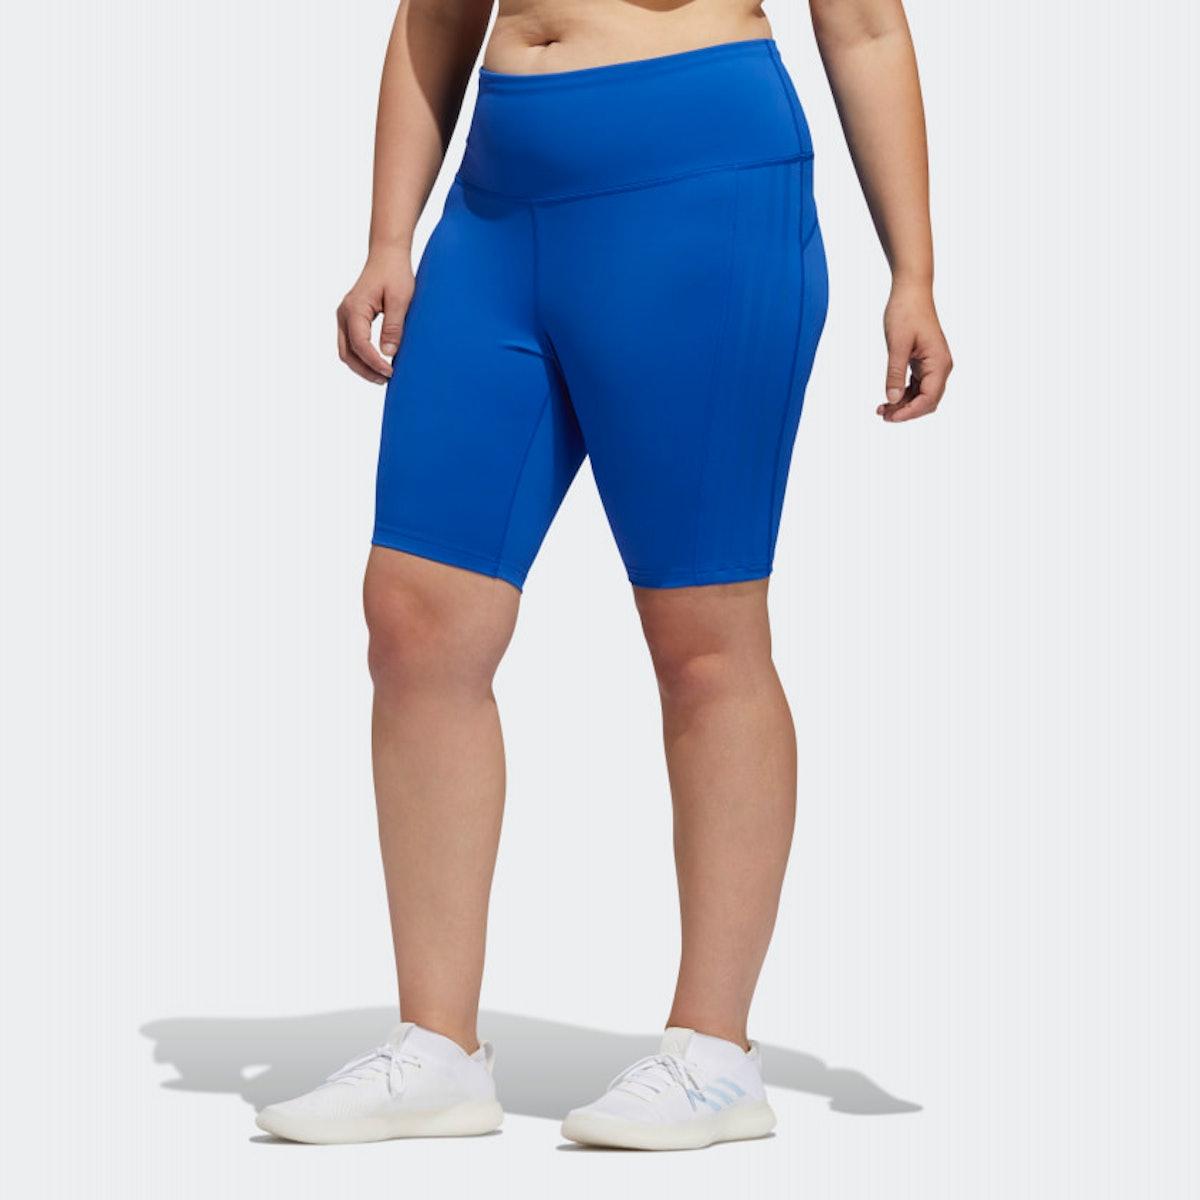 Adidas x Universal Standard 3-Stripes Short Stripes (Plus Size)